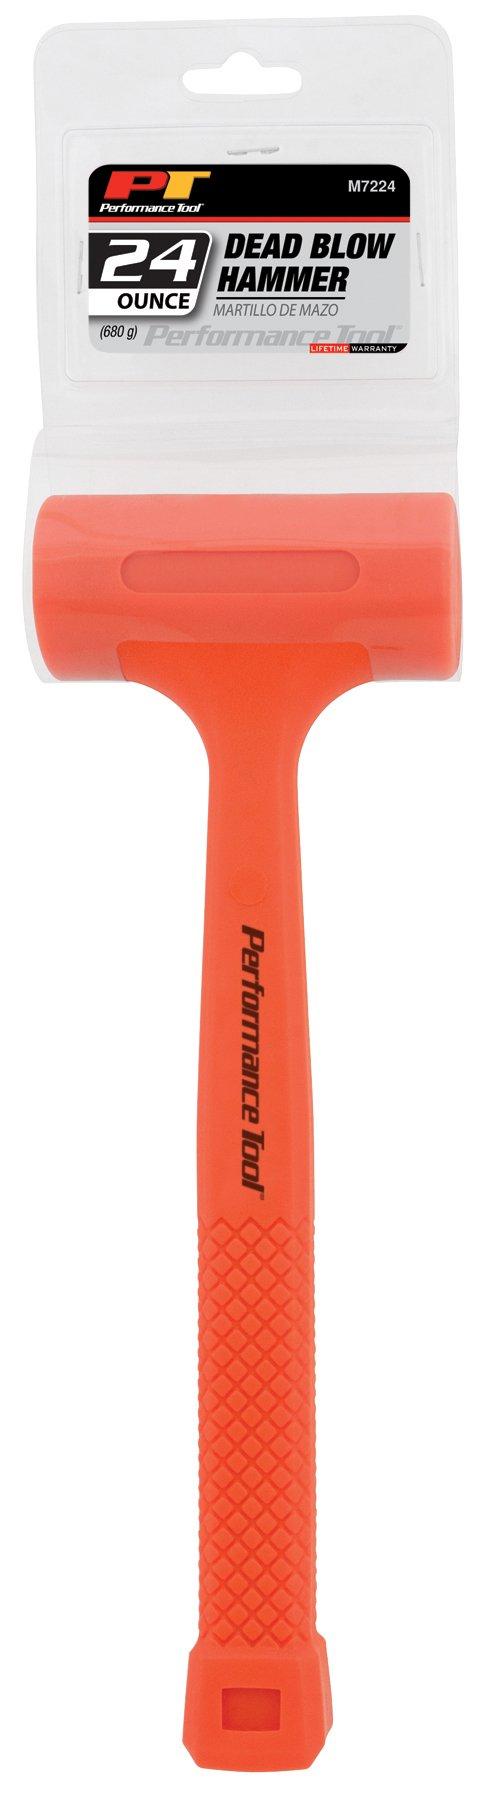 Performance Tool M7224 24-Ounce High-Visual Dead Blow Hammer - 24oz